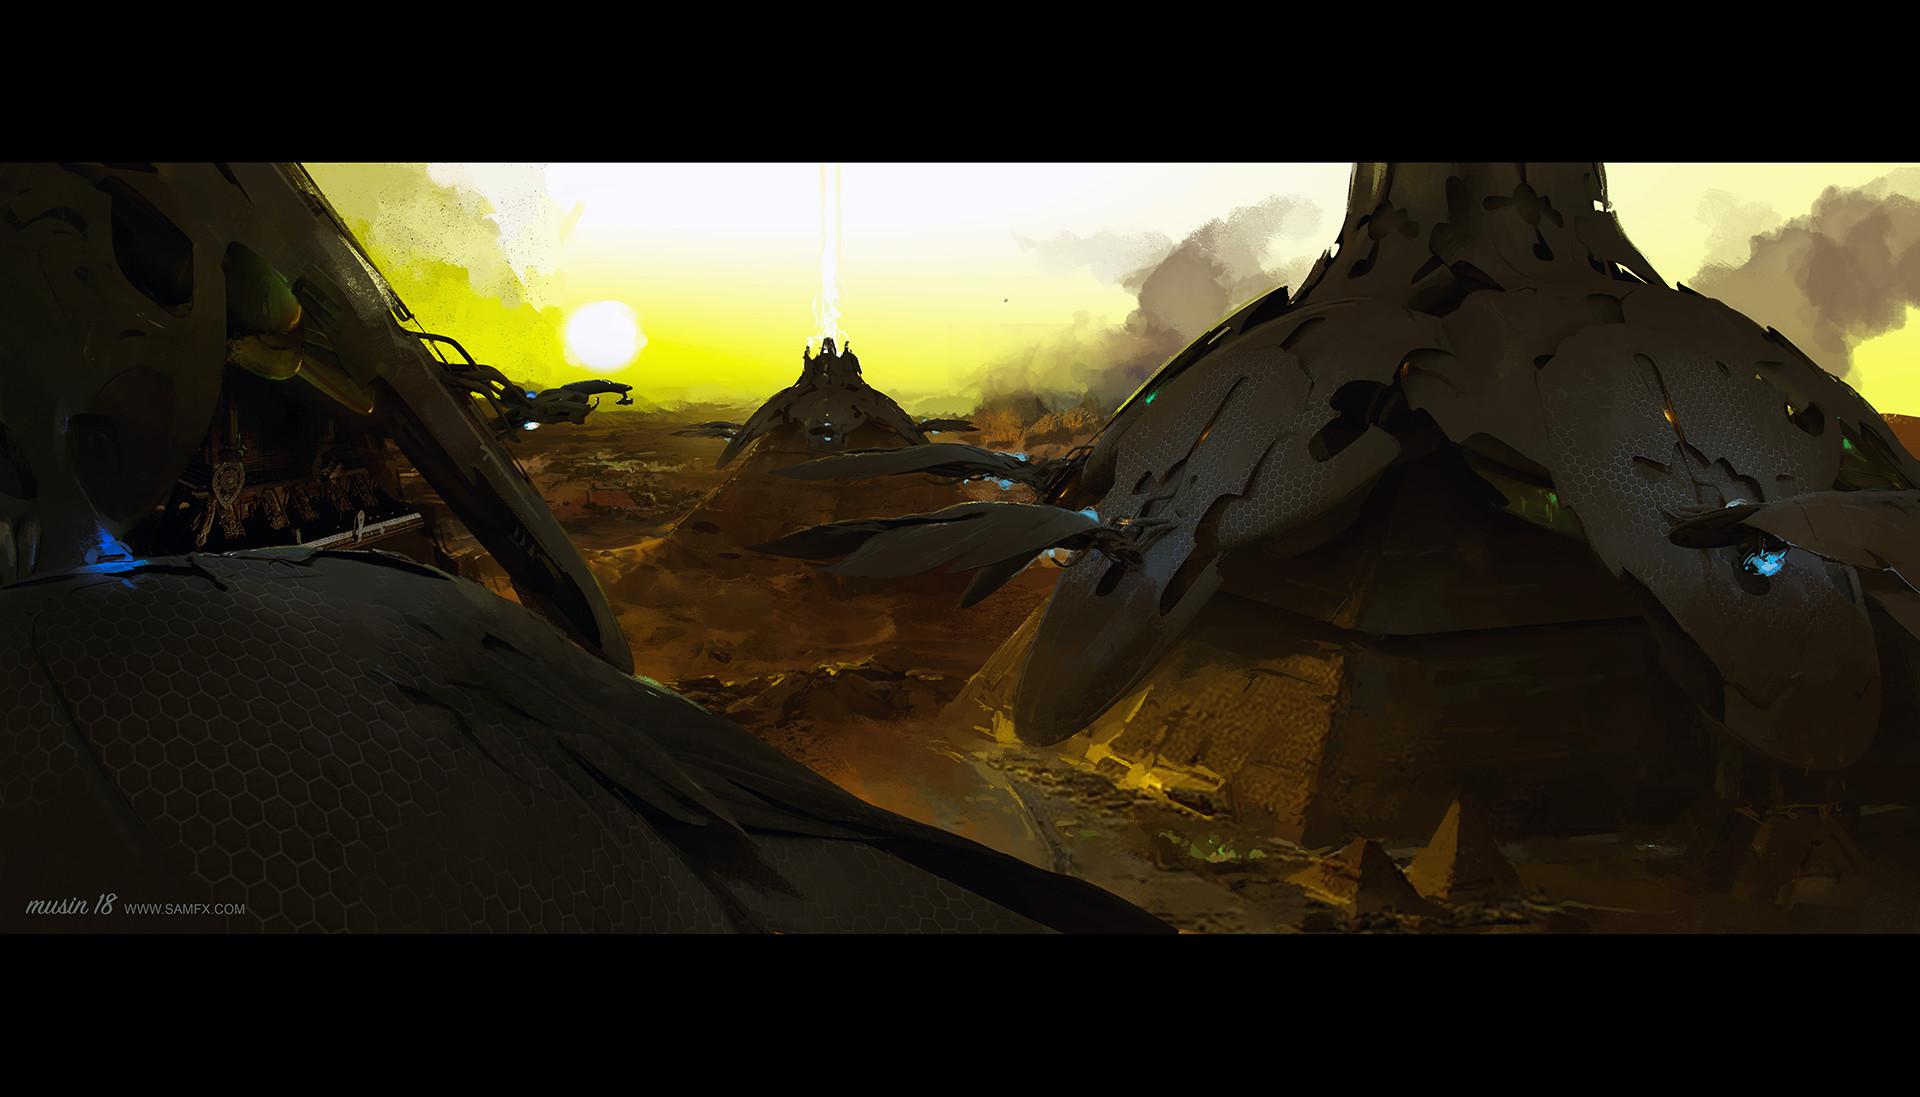 Sergey musin shiva fleet over the pyramids ver2 2